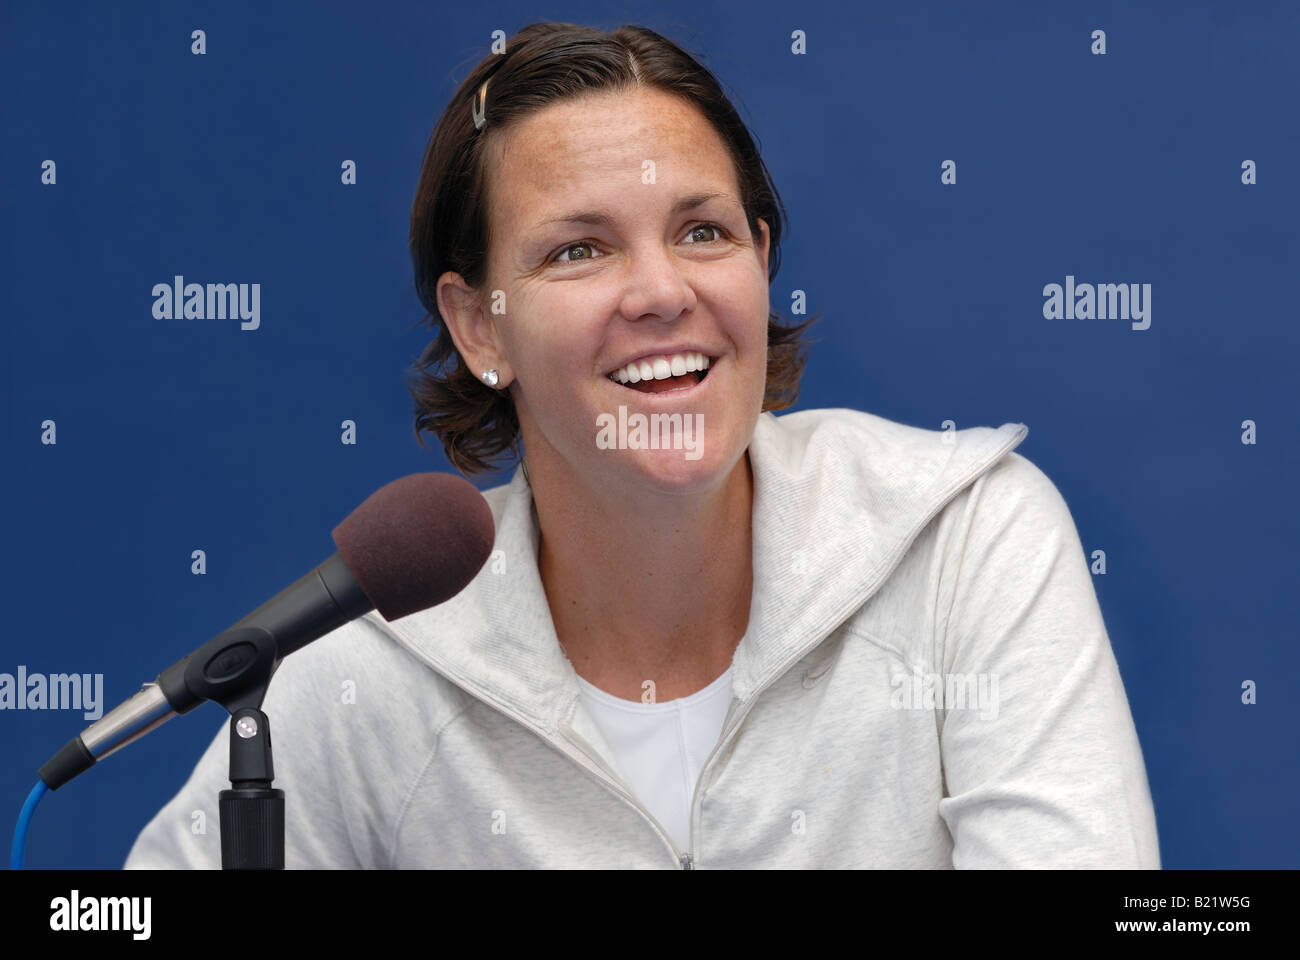 Lindsay Davenport Professional Womens Tennis Champion Stock